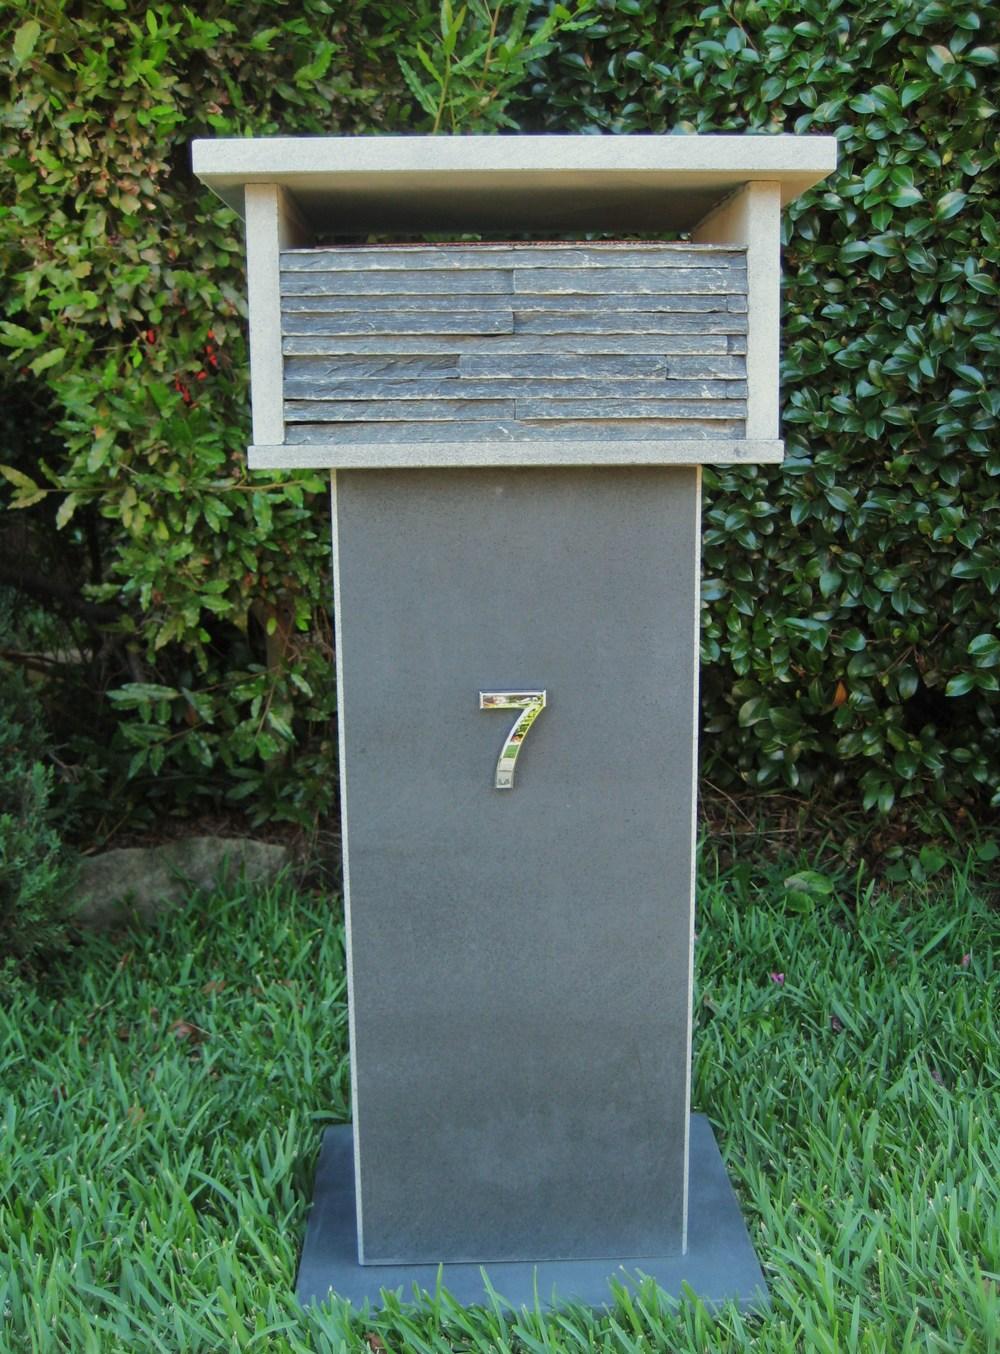 4. Bluestone Letterbox solid, aluminium back door with 2 key lock 860cm high top part mesure 300mm x 400mm. $451